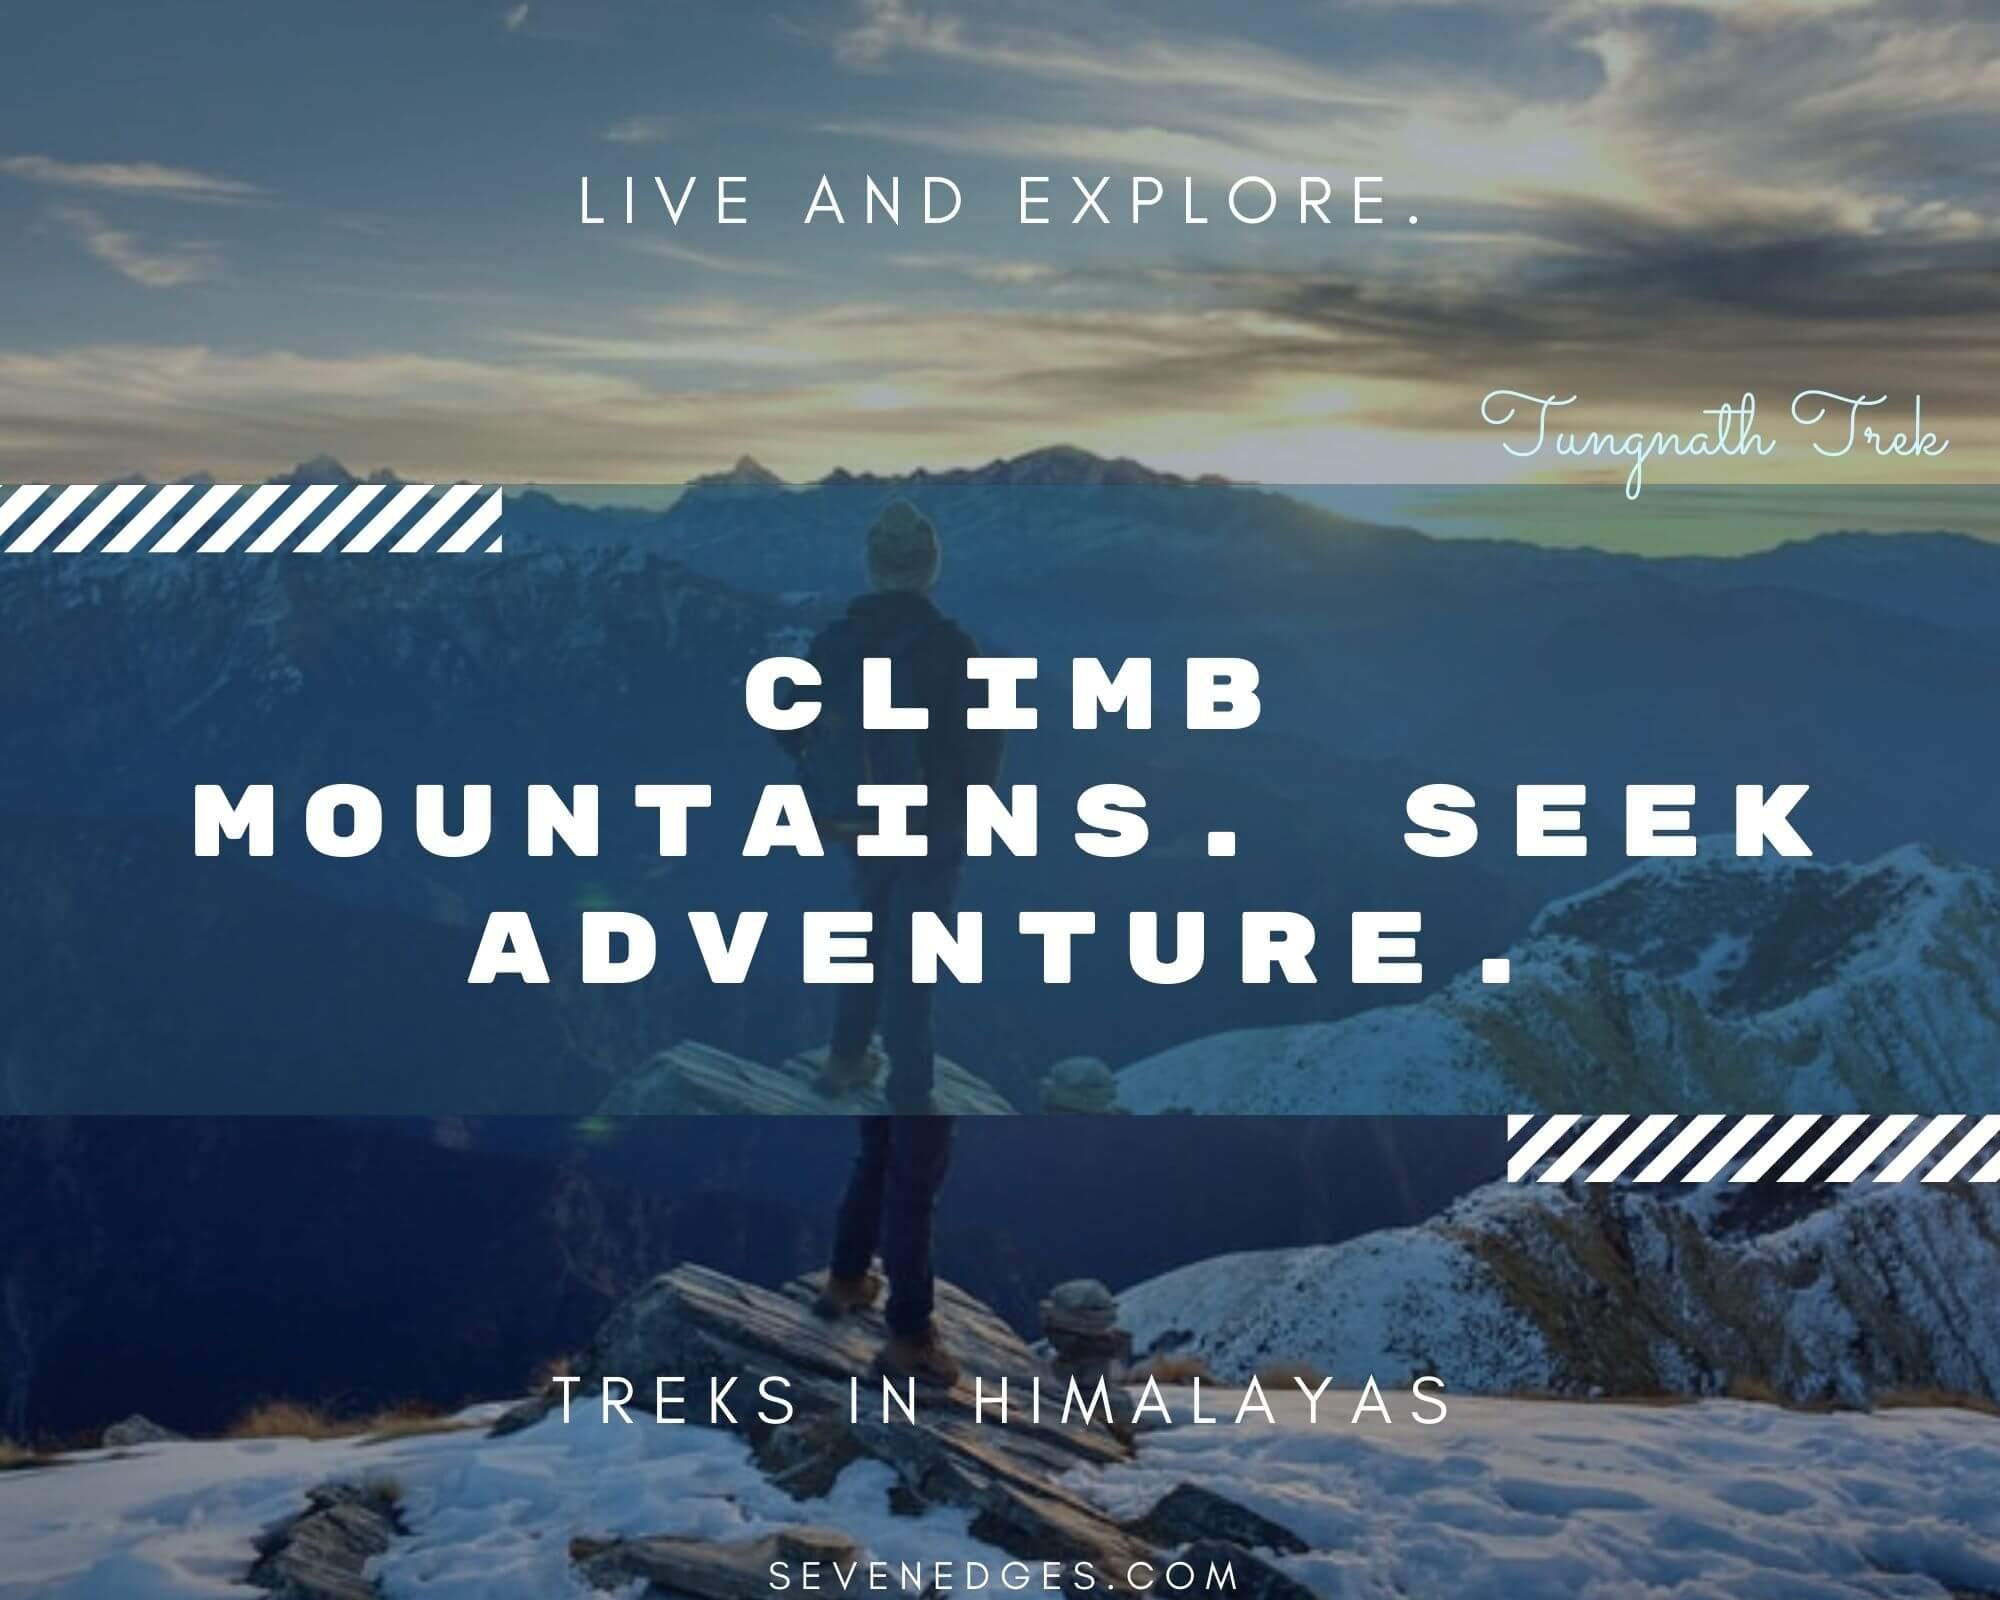 Treks in Himalayas